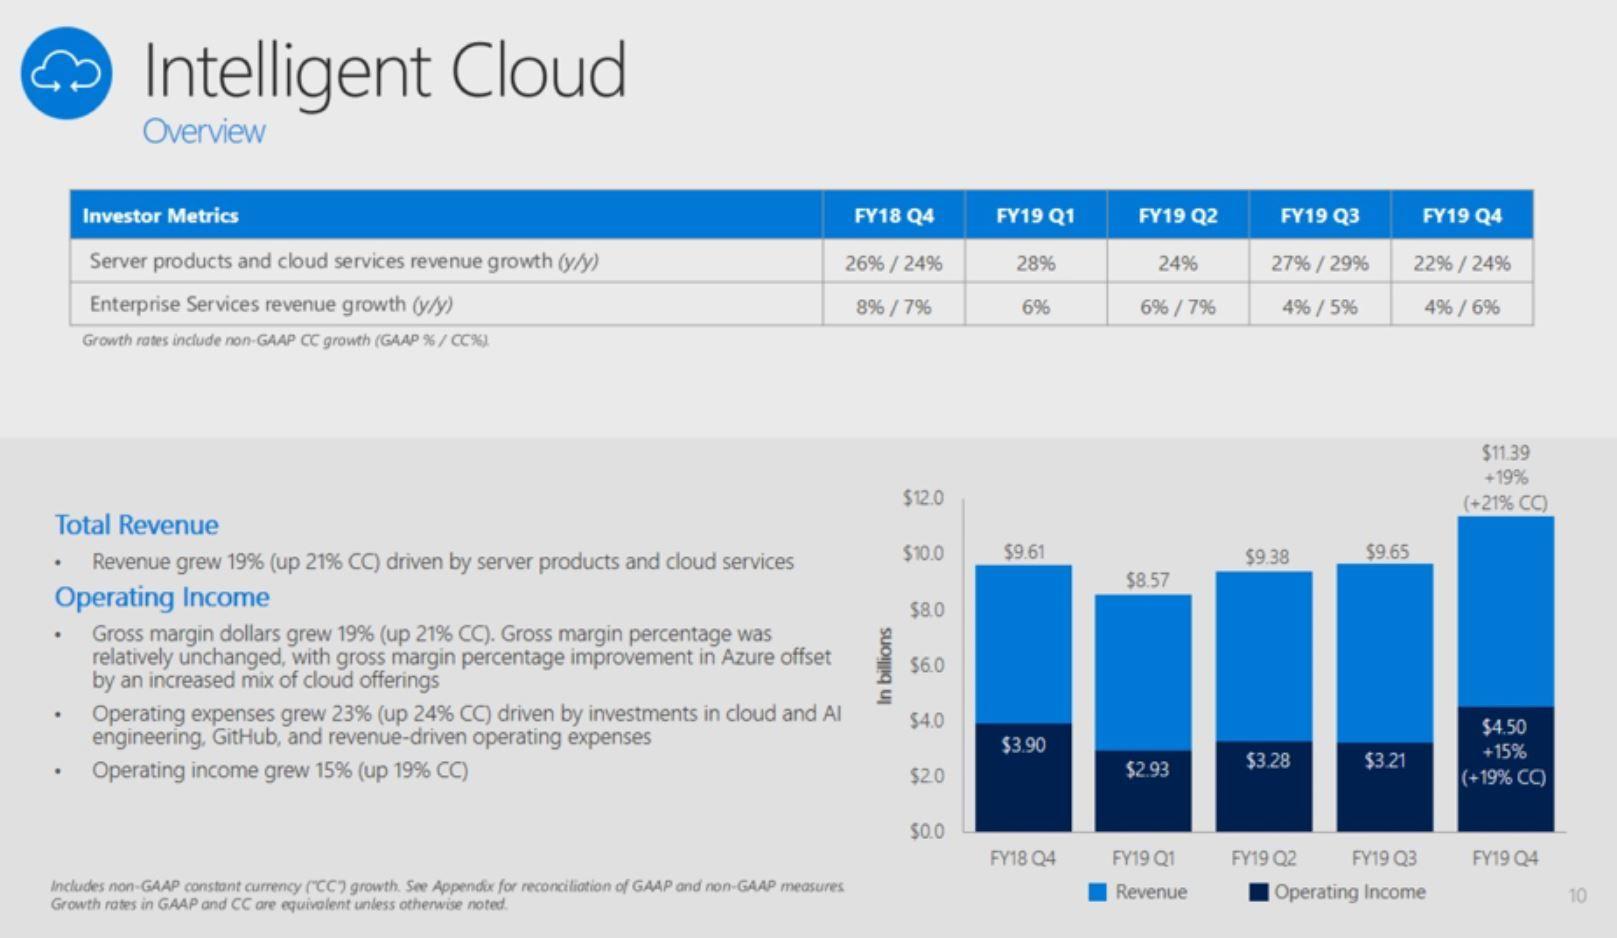 Microsoft決算、クラウド部門の売り上げがWindows部門超え ゲーム部門以外は増収増益